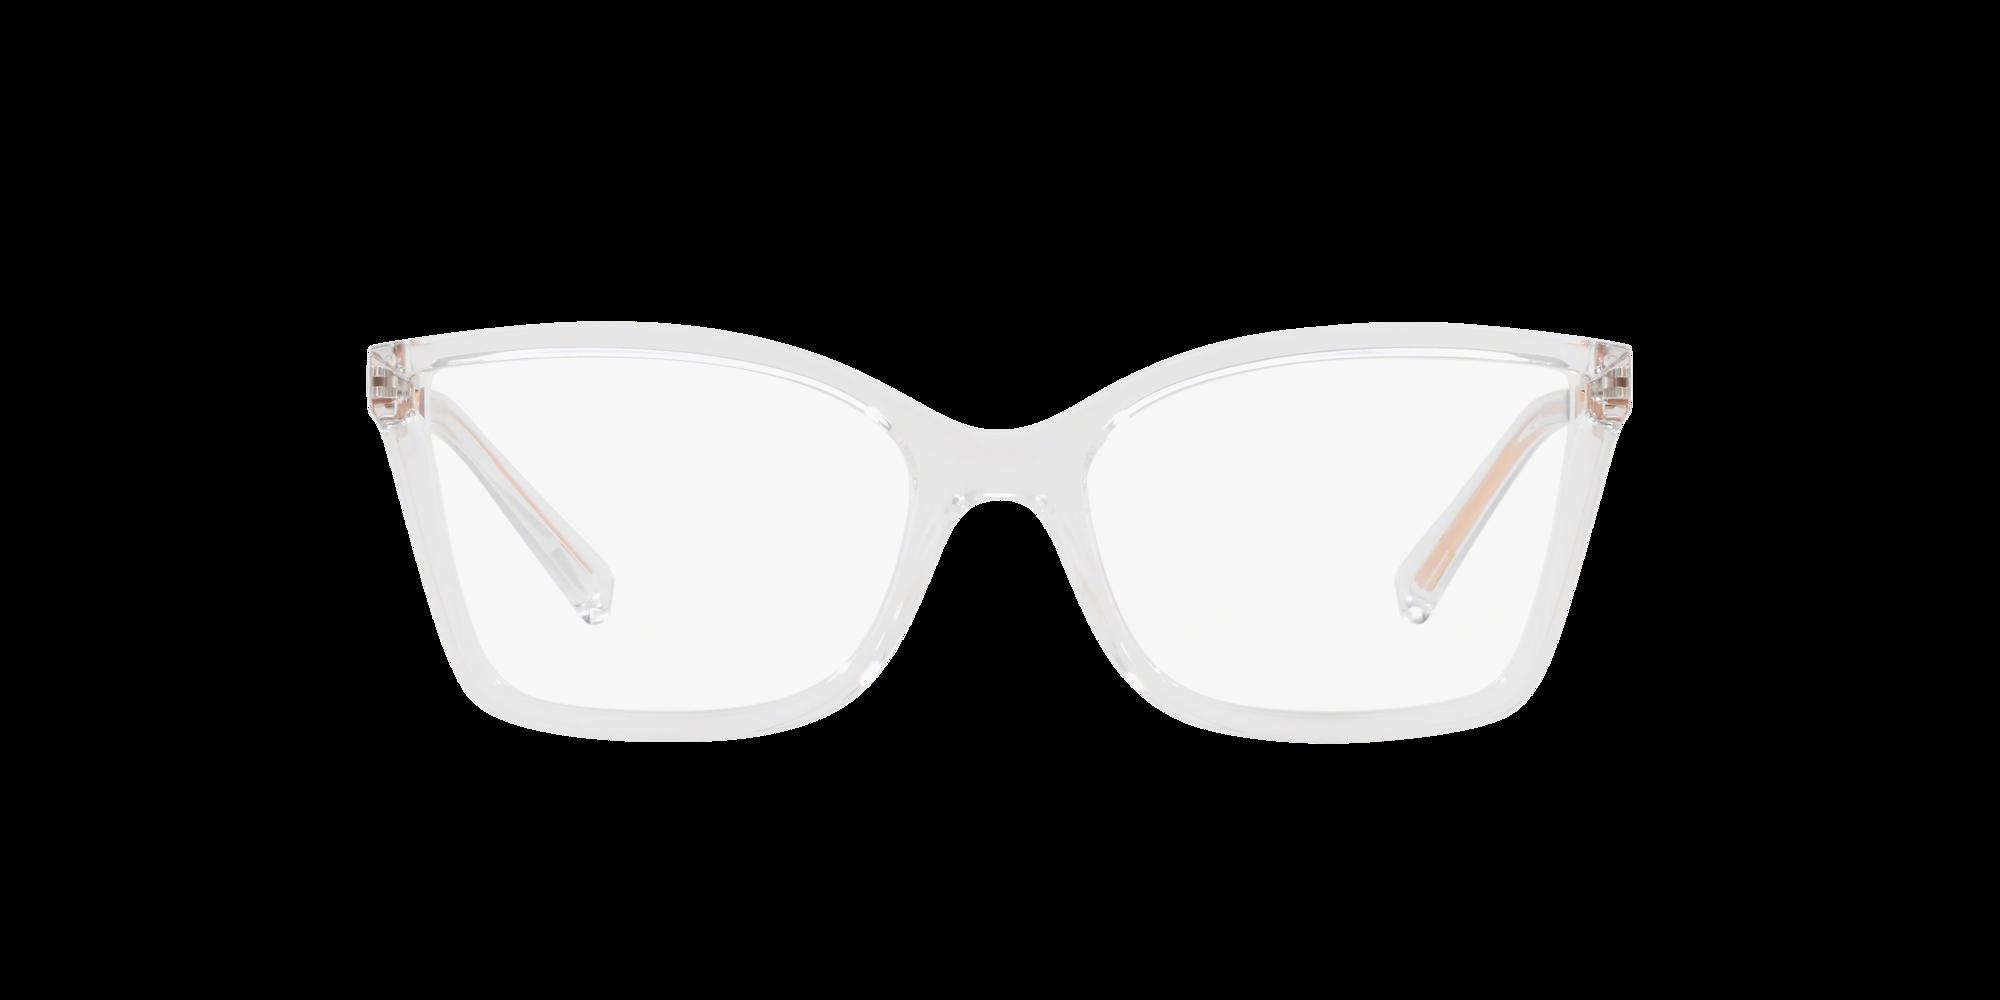 Image for MK4058 CARACAS from LensCrafters | Glasses, Prescription Glasses Online, Eyewear